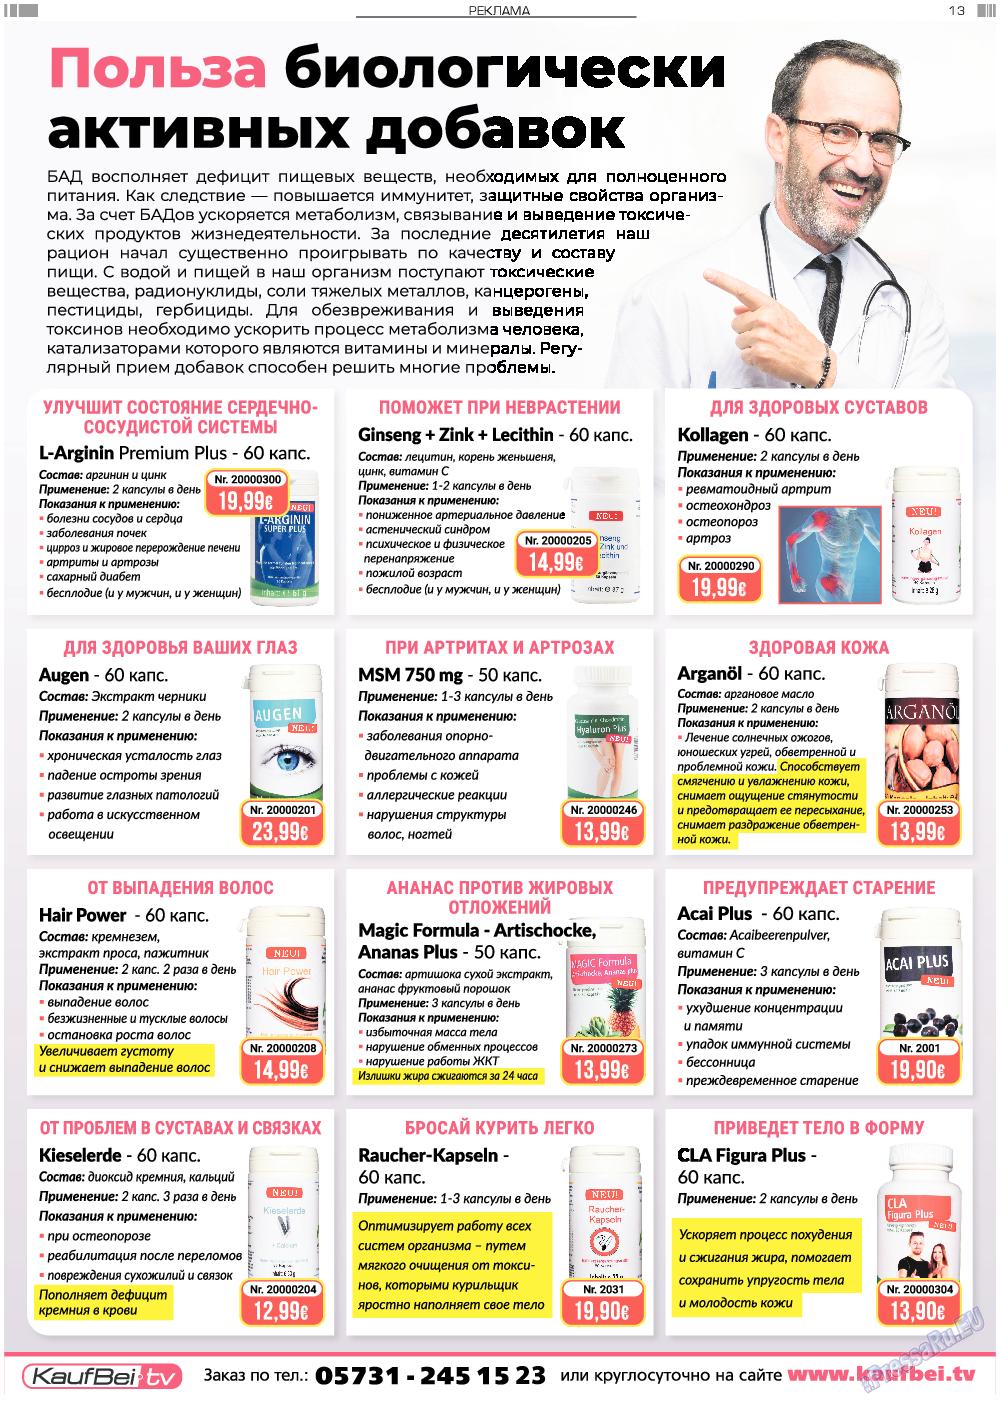 Анонс (газета). 2019 год, номер 4, стр. 13